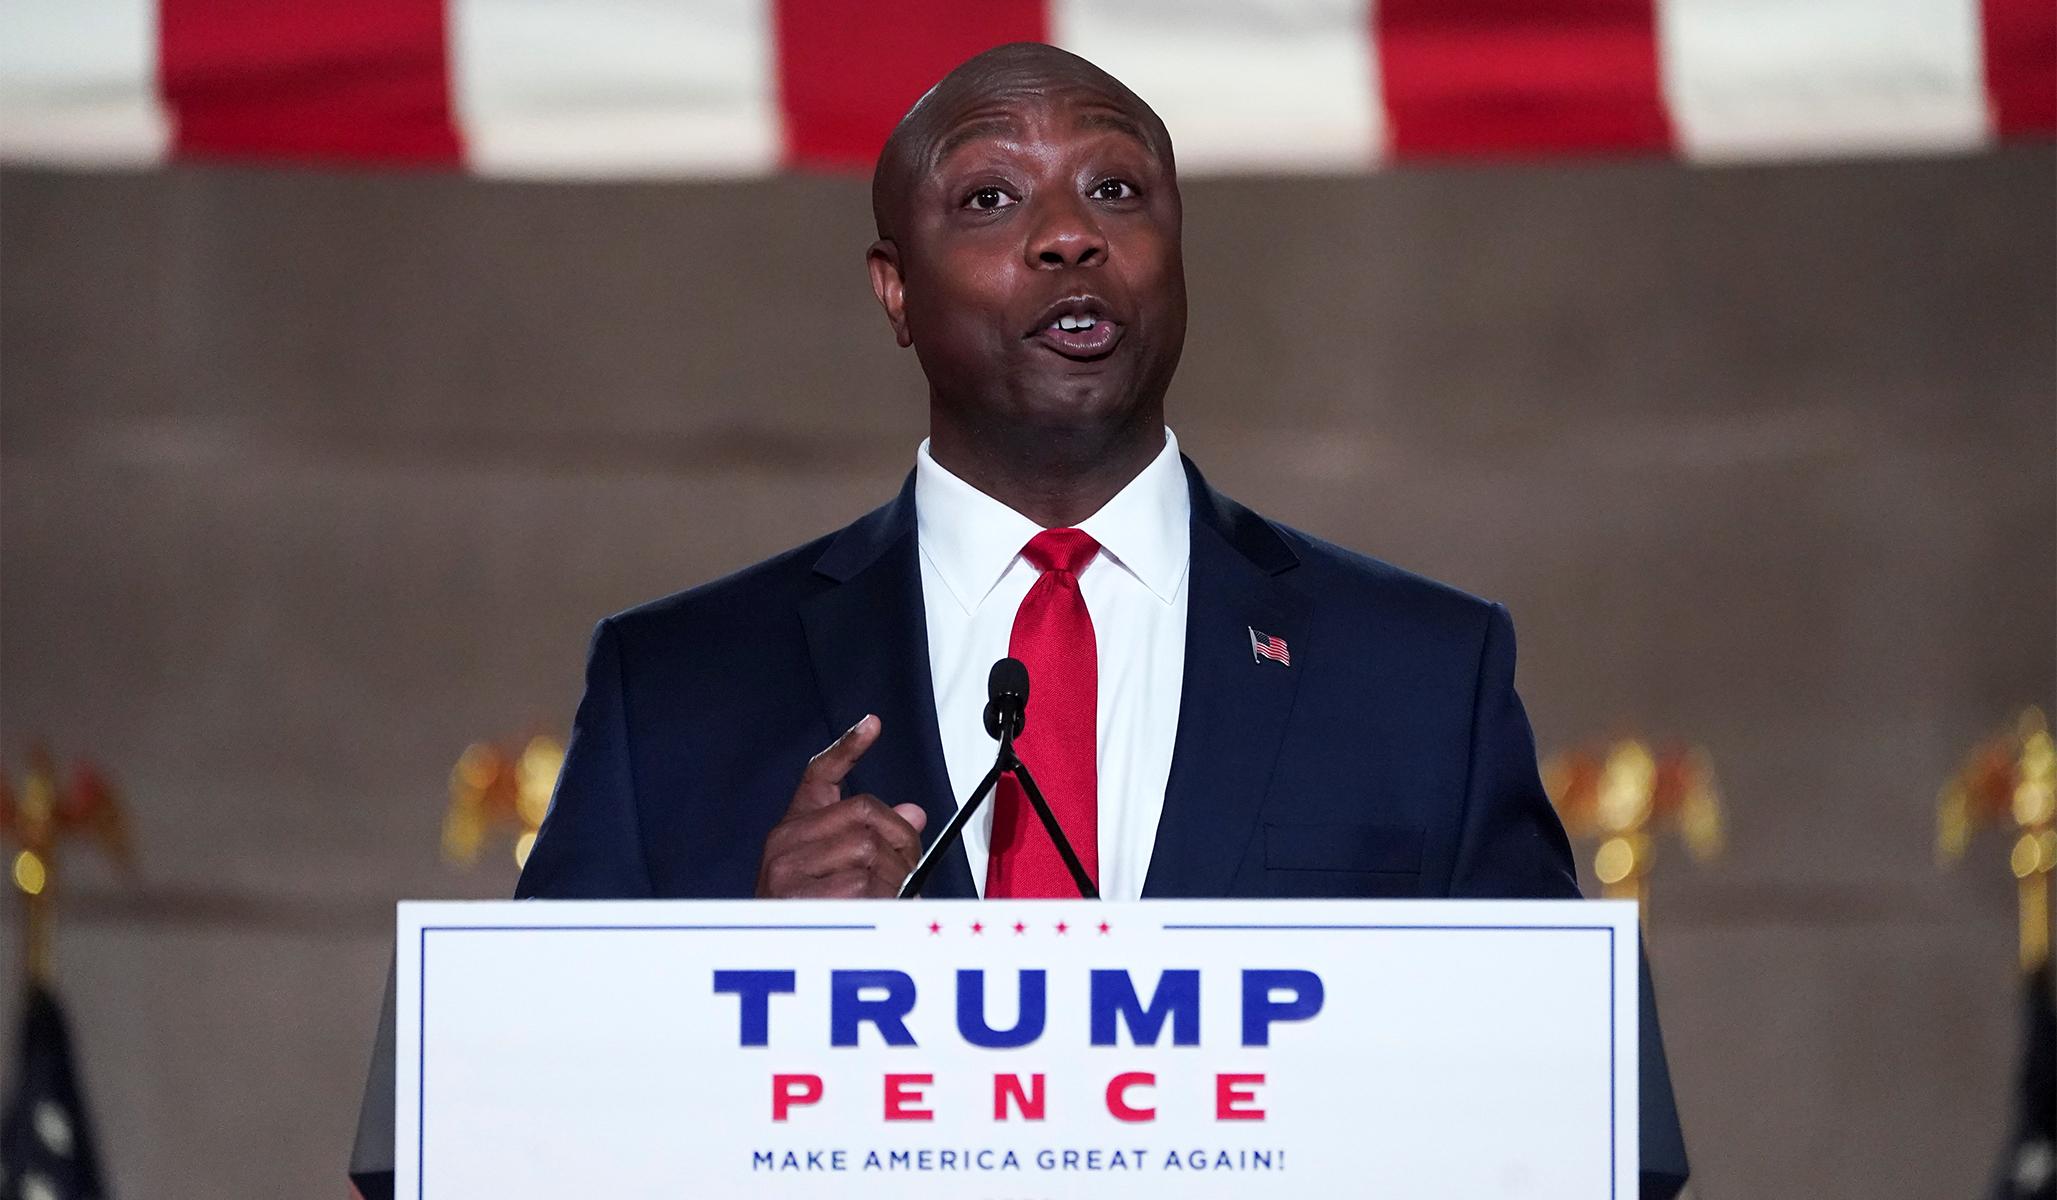 Tim Scott's Republican National Convention Speech Wows | National Review